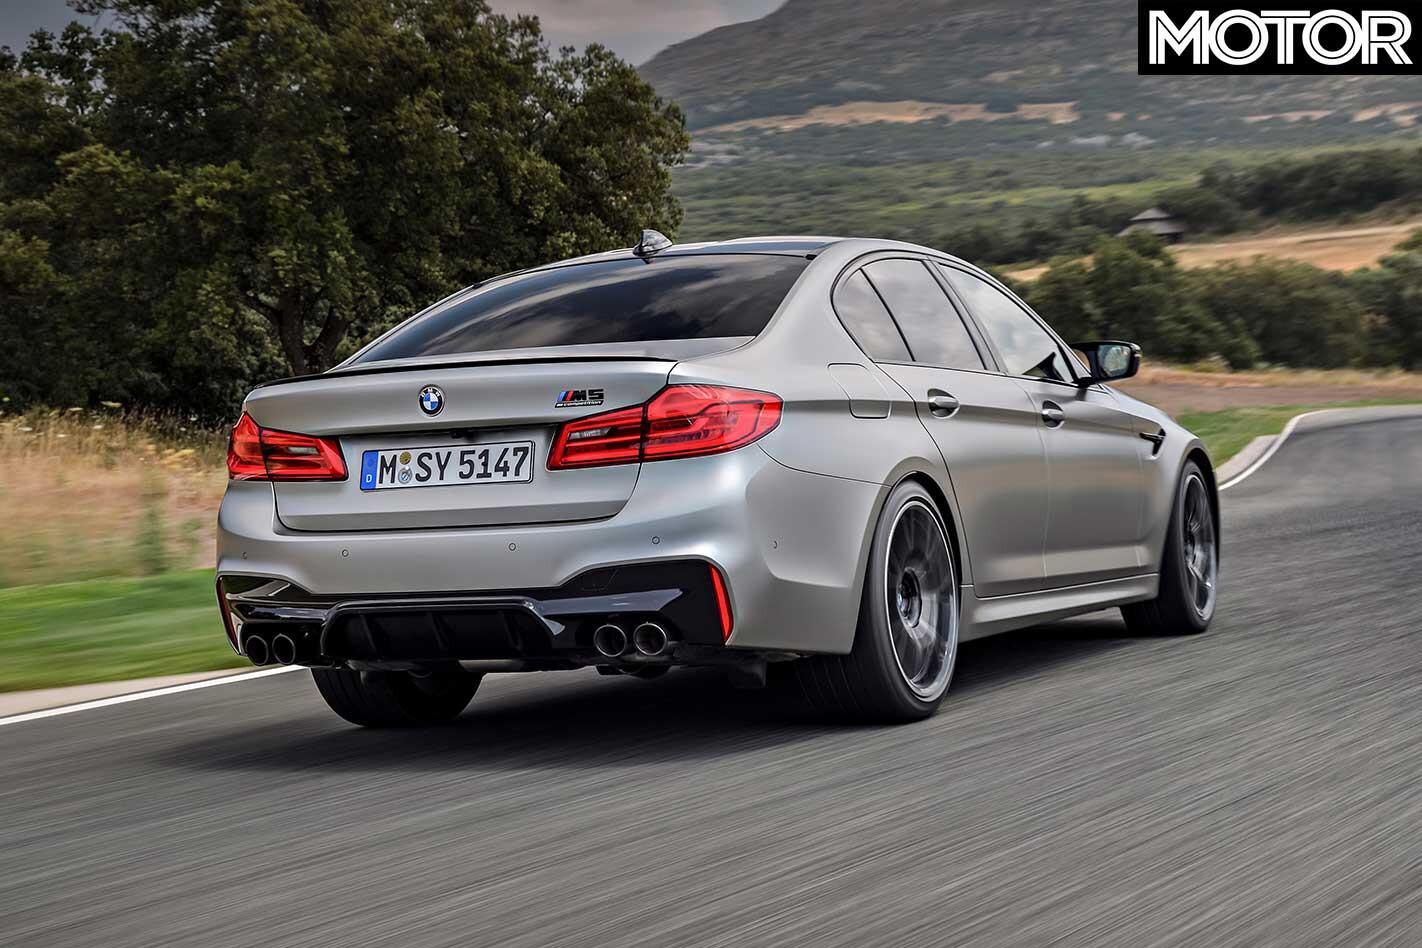 BMW M 5 Competition Rear Jpg